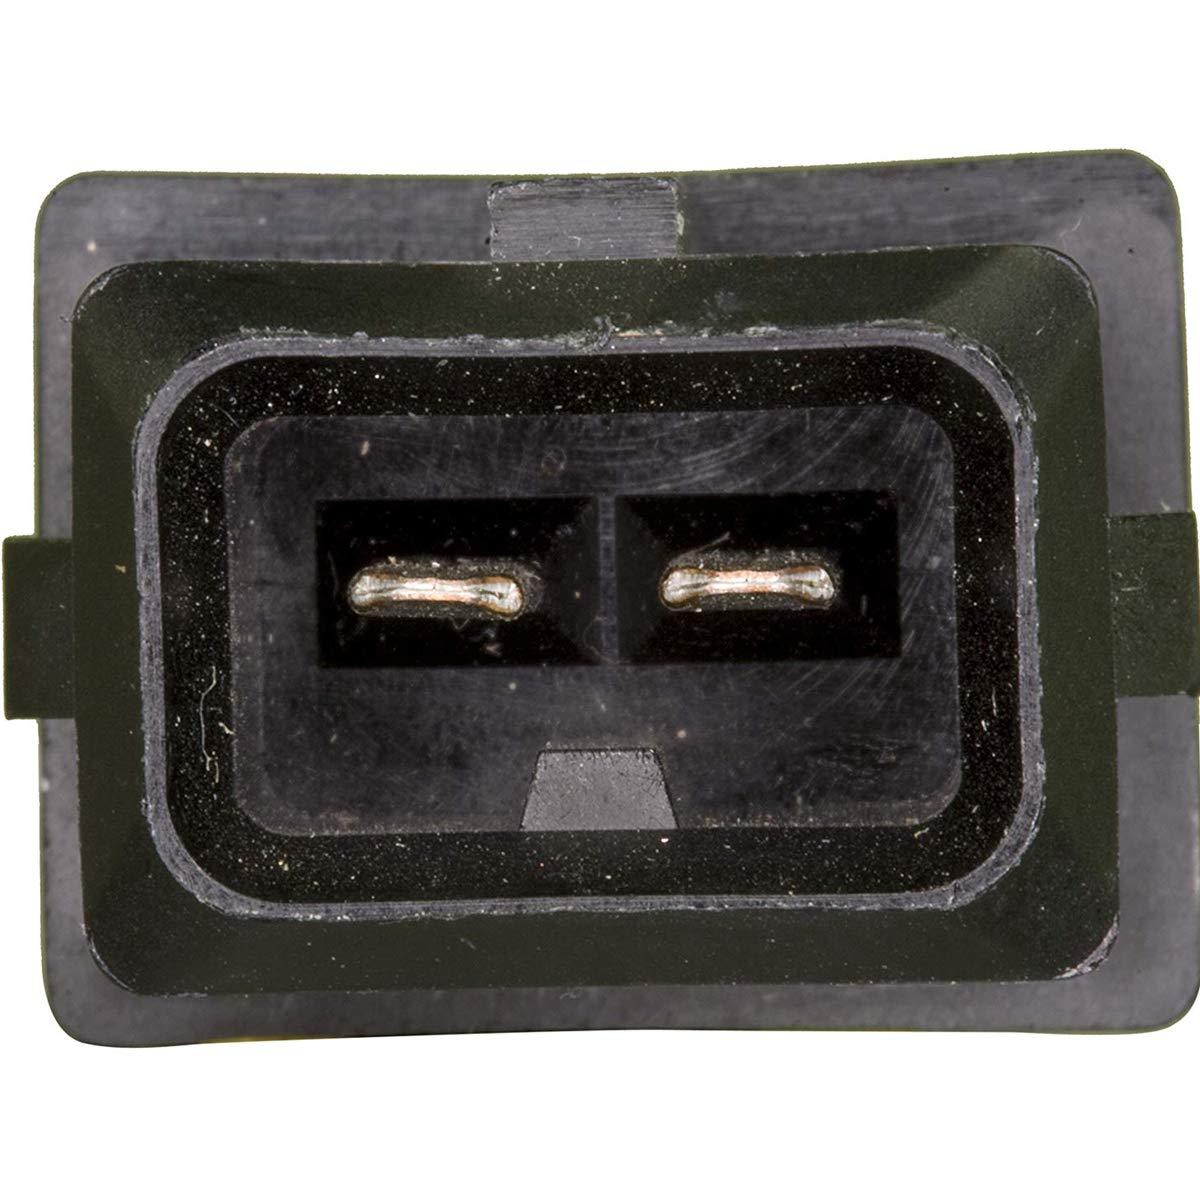 RA-KS1035 Ignition Knock 4606 093 4606 093AD Compatible with Chrysler Detonation Sensor 242-1061 Ramco Automotive Dodge